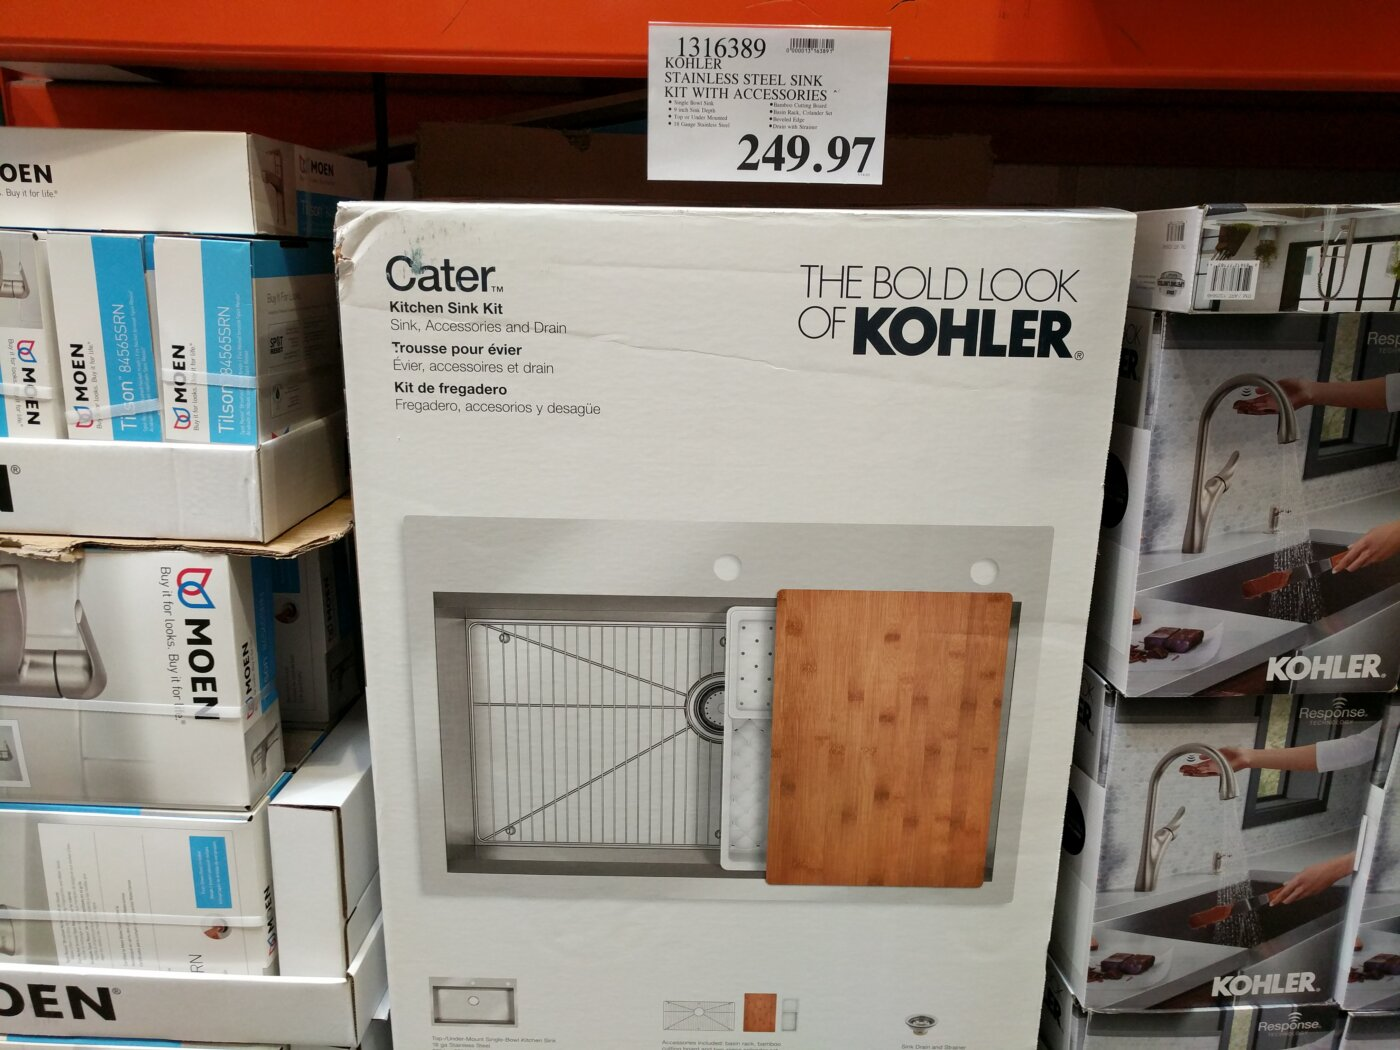 kohler stainless steel sink kit with